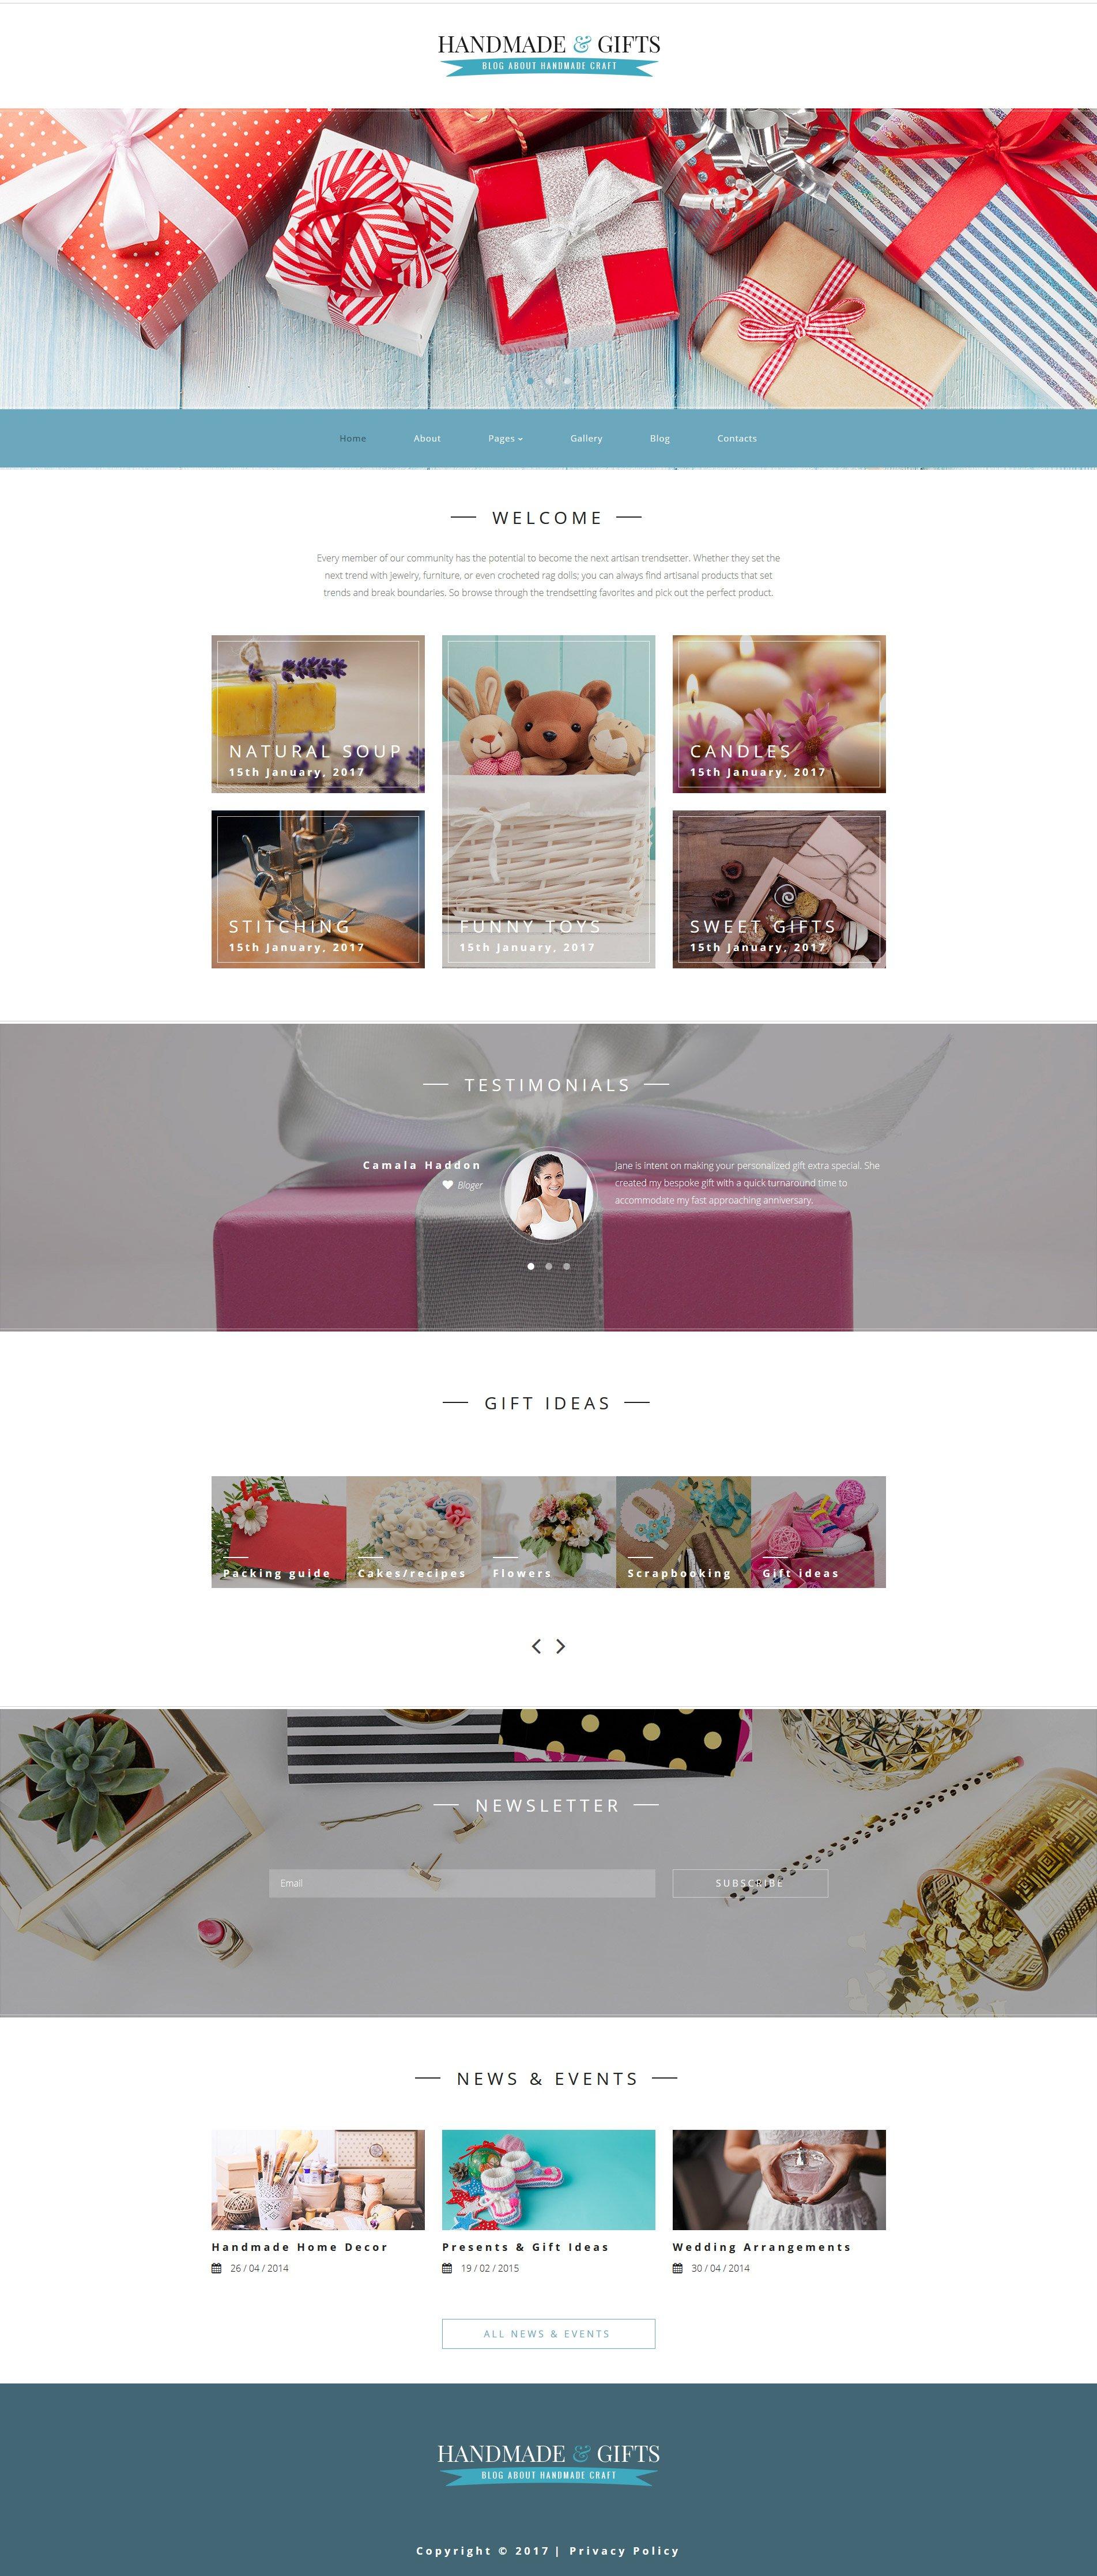 Reszponzív Handmade & Gifts - Crafts Blog and Gift Store Joomla sablon 62277 - képernyőkép